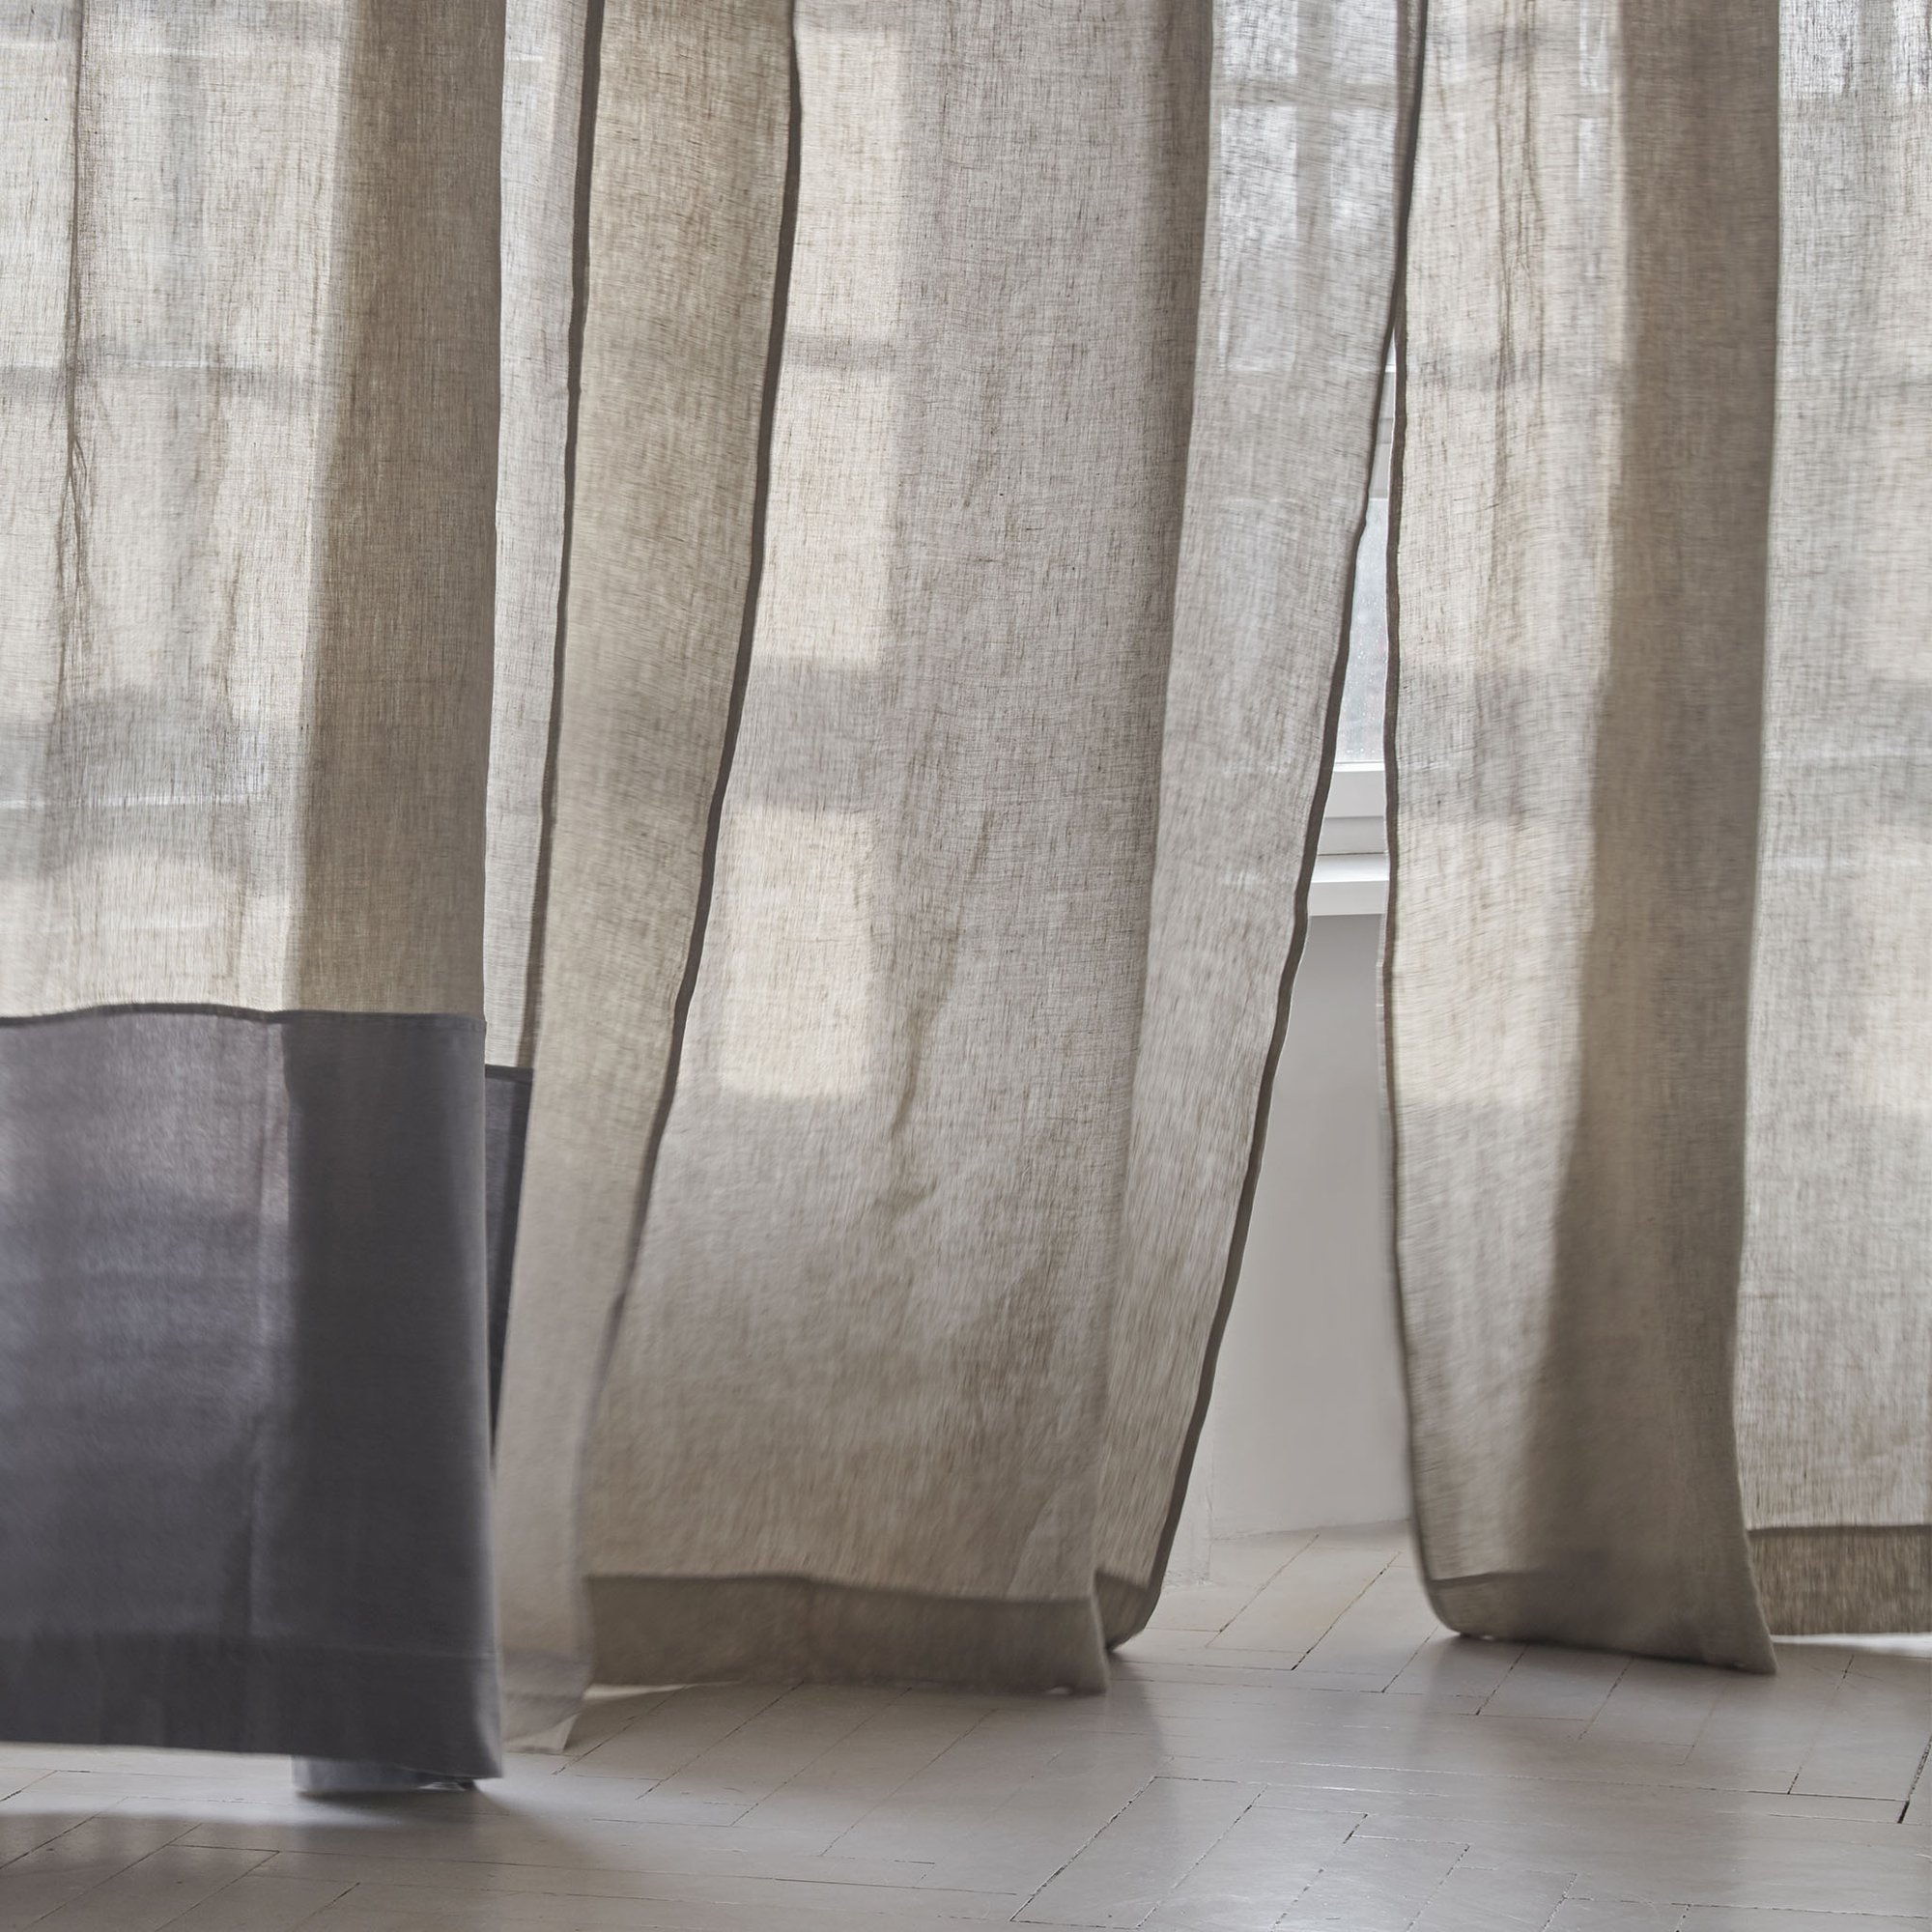 Full Size of Vorhang Etova Vorhänge Küche Schlafzimmer Wohnzimmer Wohnzimmer Vorhänge